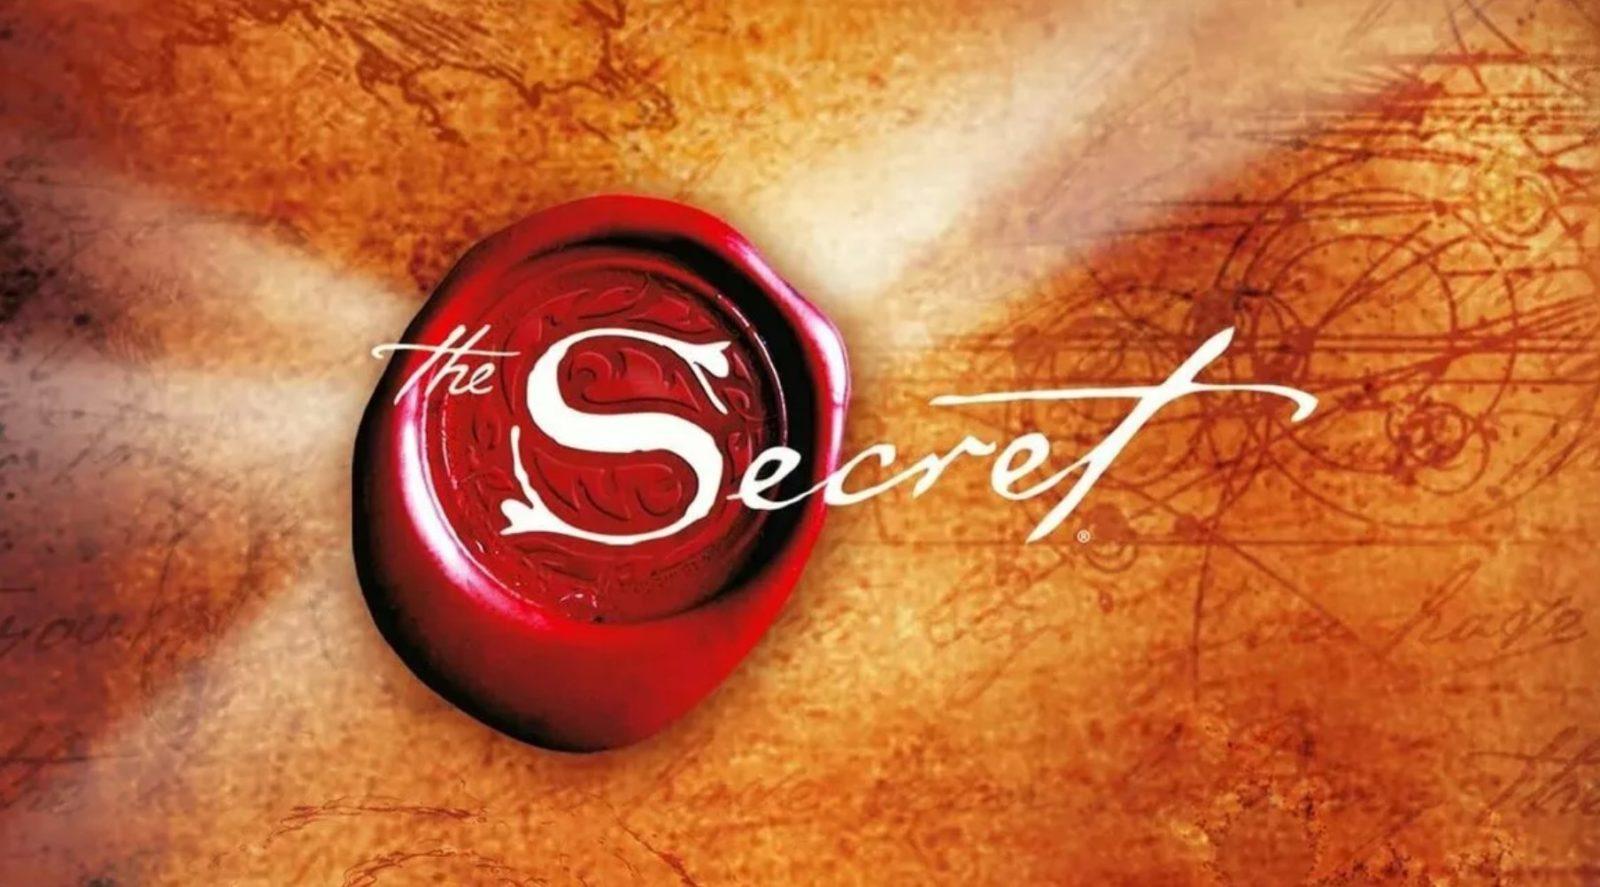 Фильм Секрет онлайн